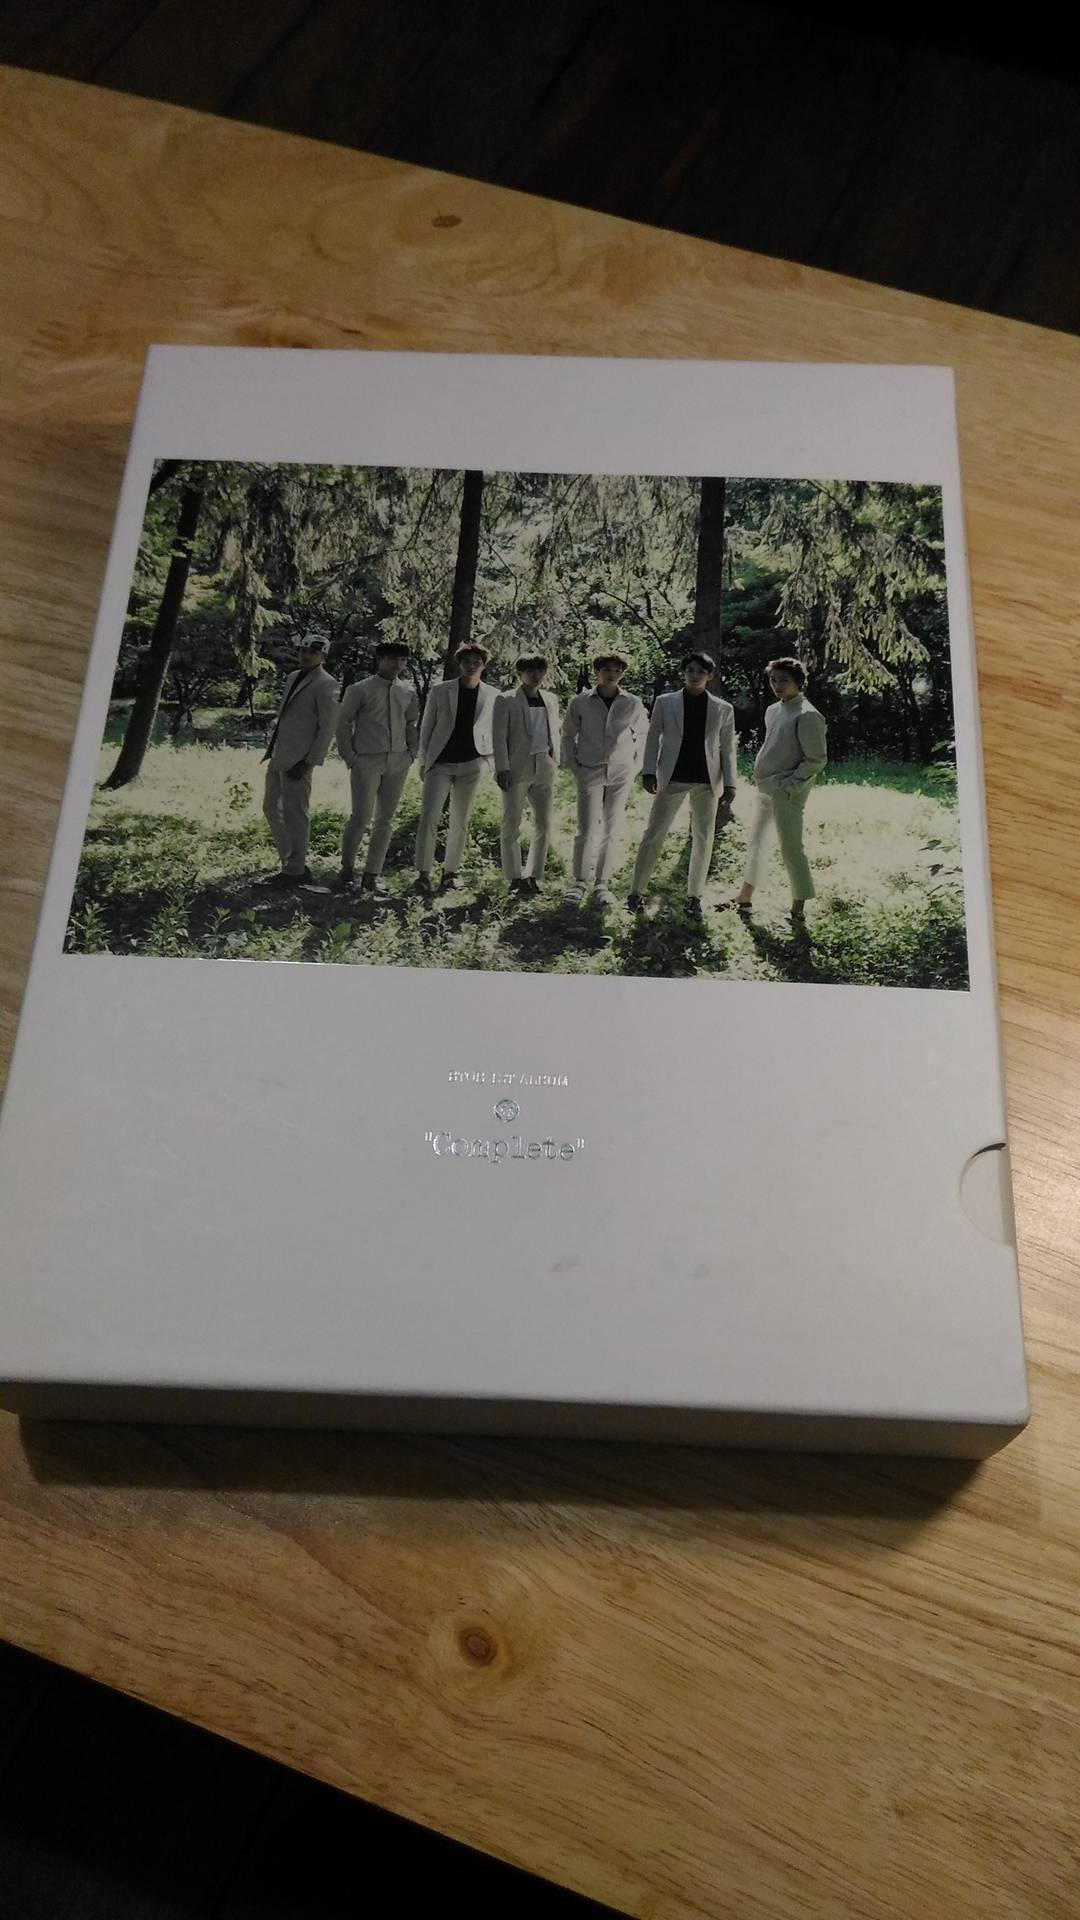 BTOB (Born to Beat) 1st Album - Complete (K-Pop)